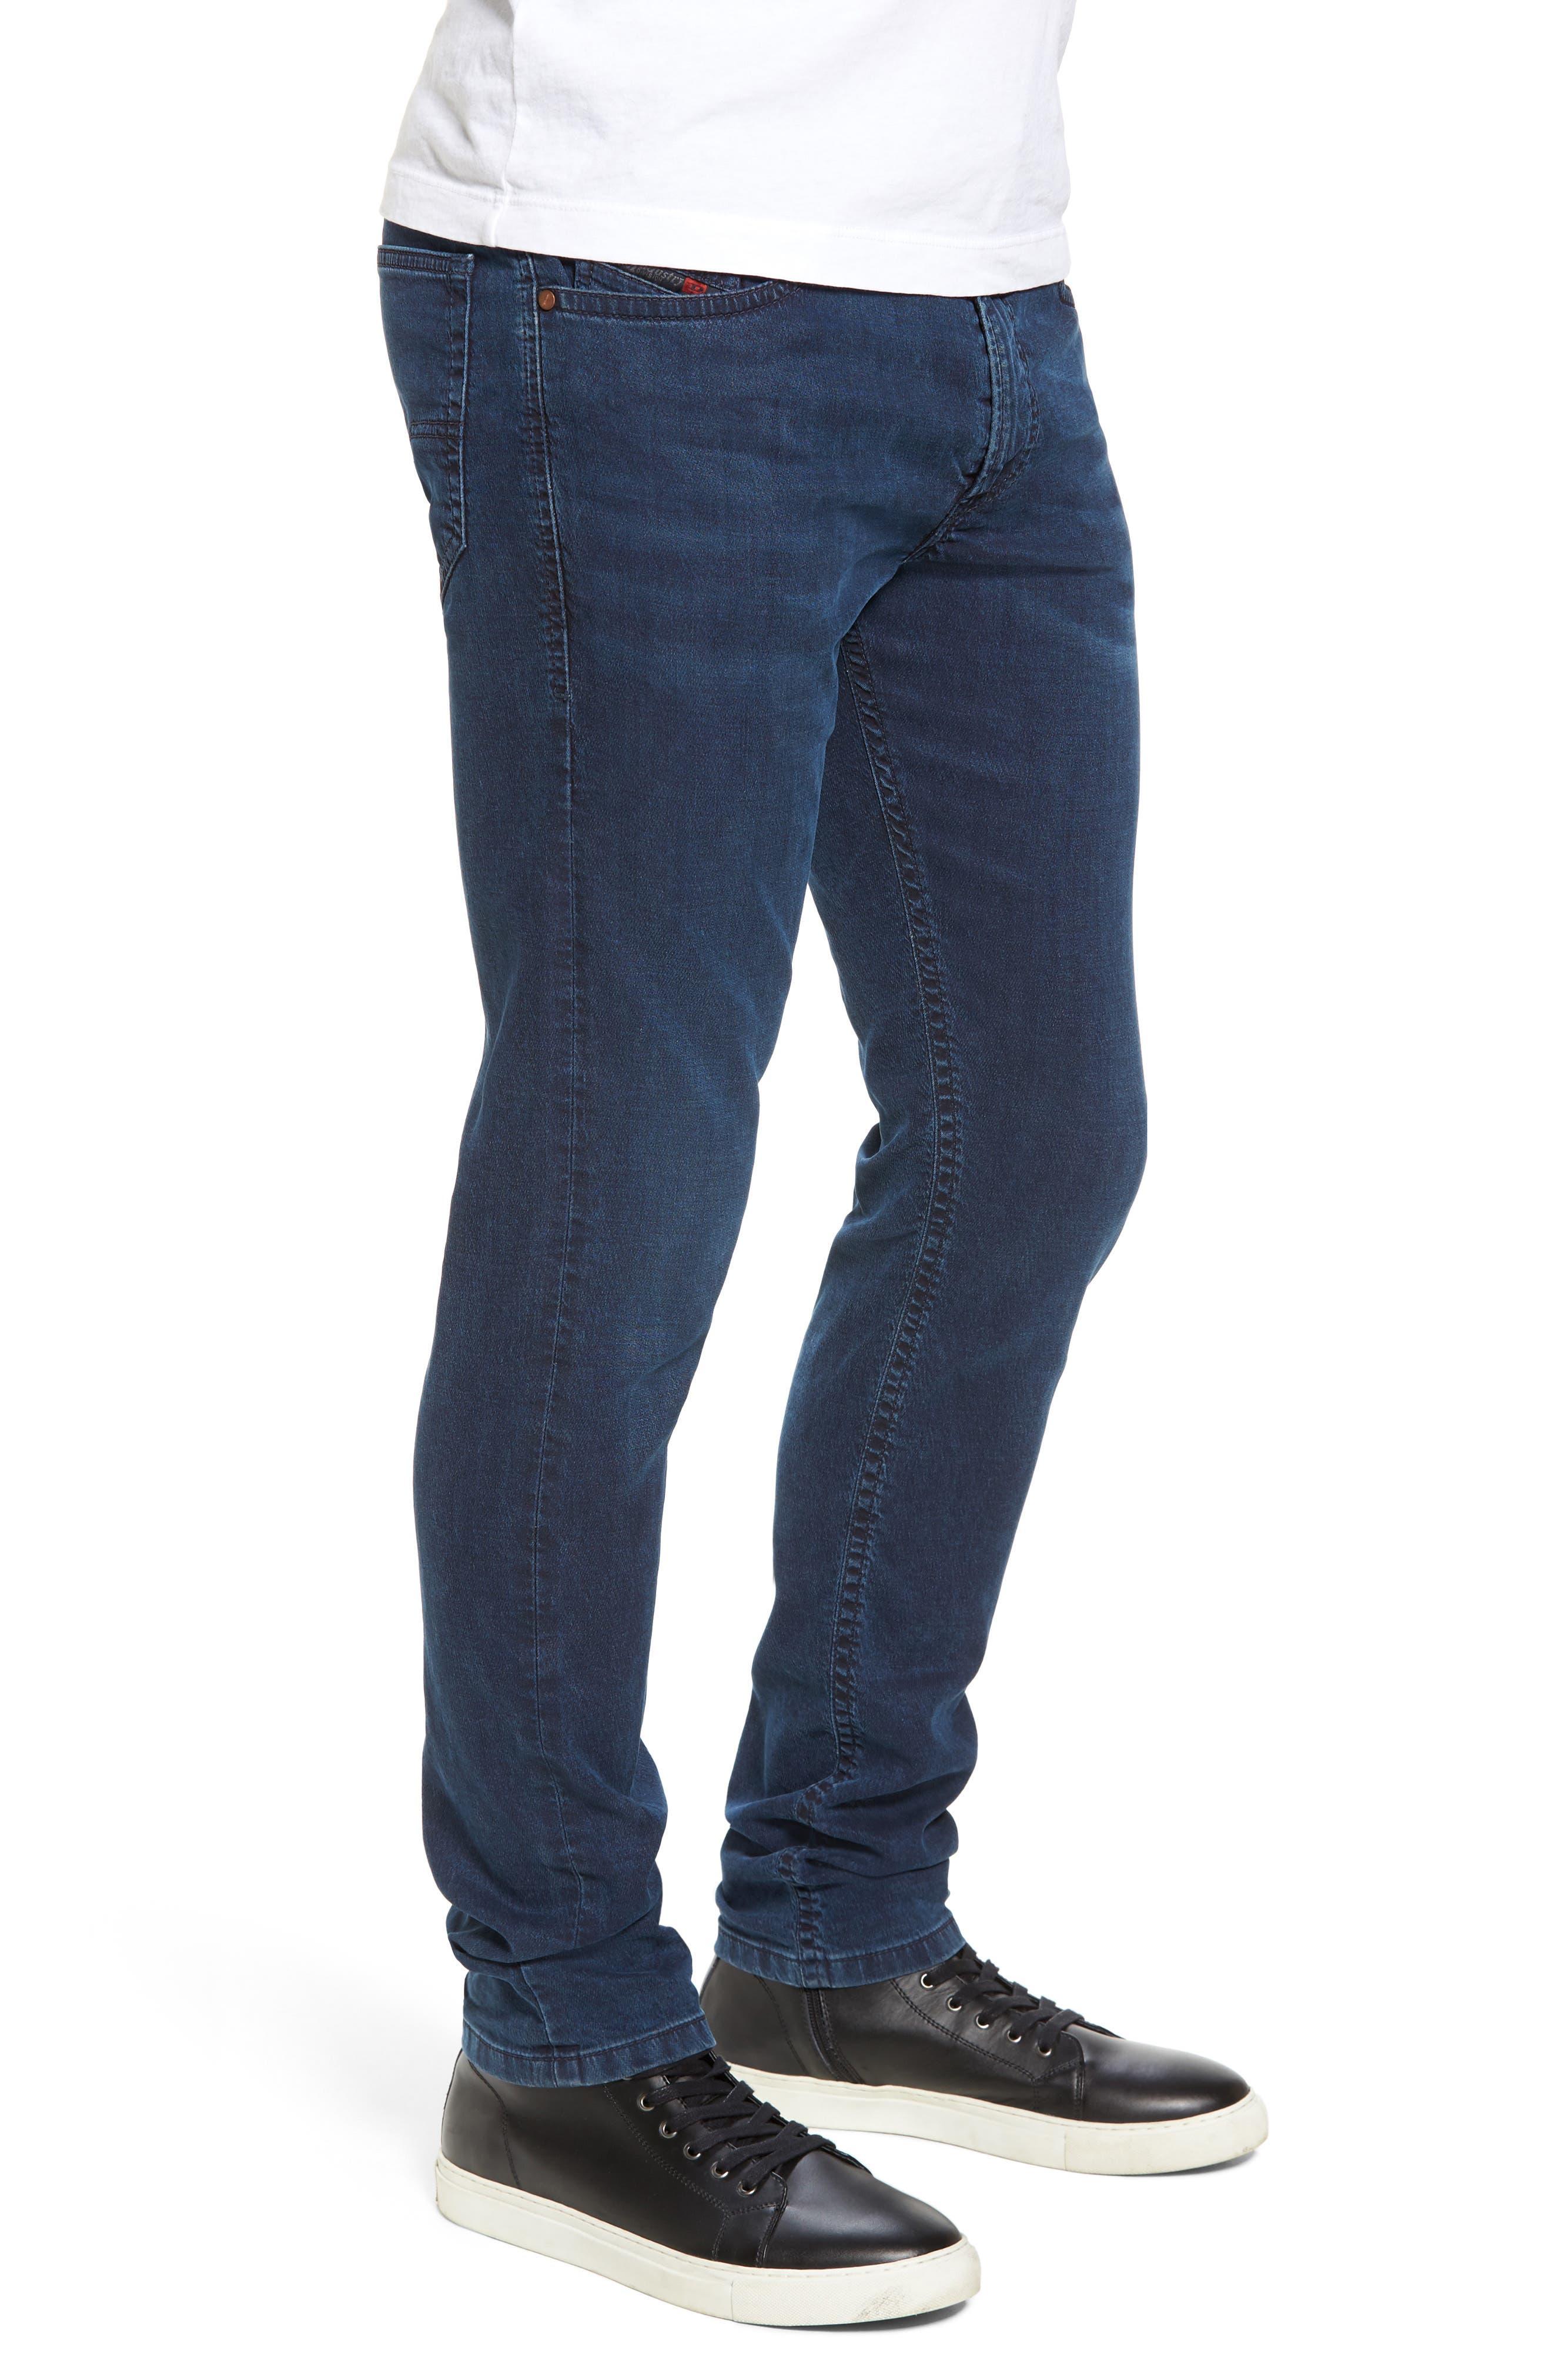 Thommer Slim Fit Jeans,                             Alternate thumbnail 3, color,                             0688J